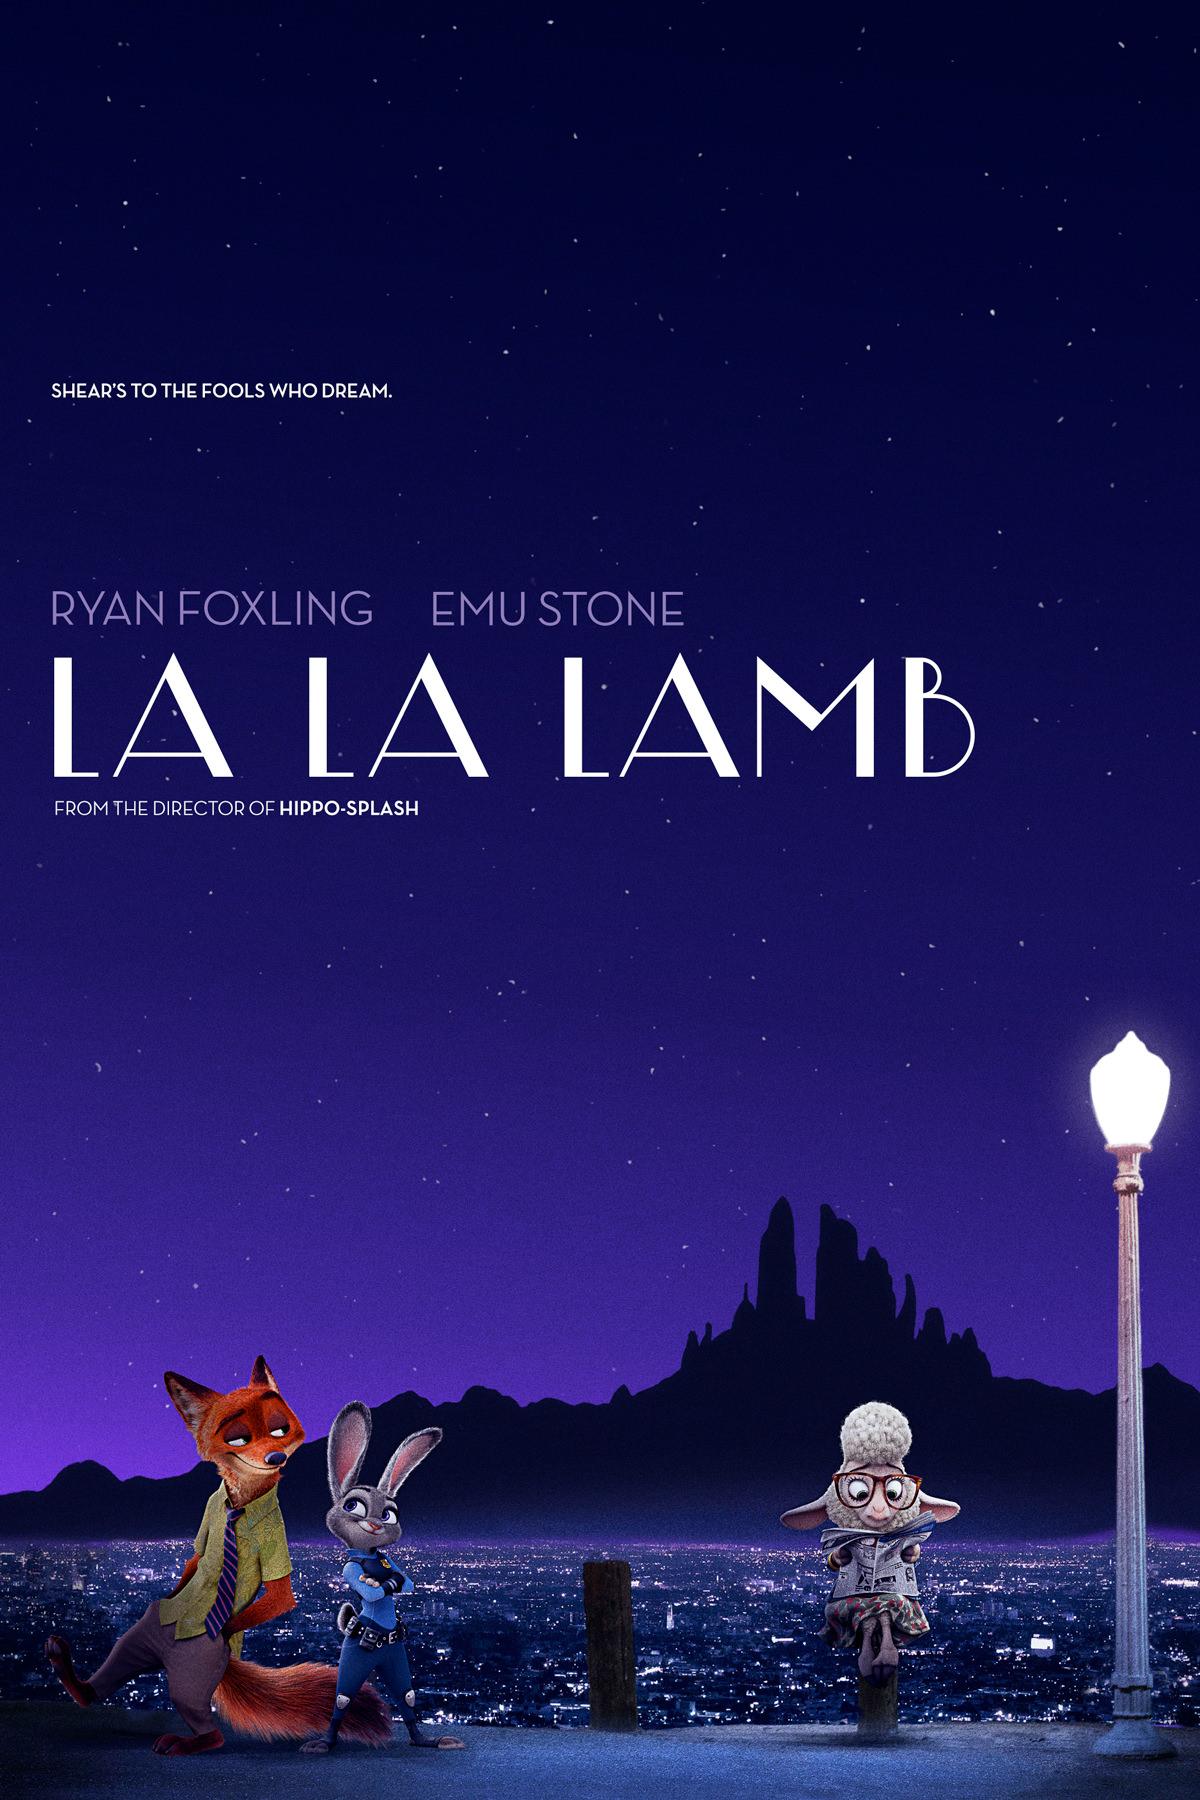 La La Land as La La Lamb